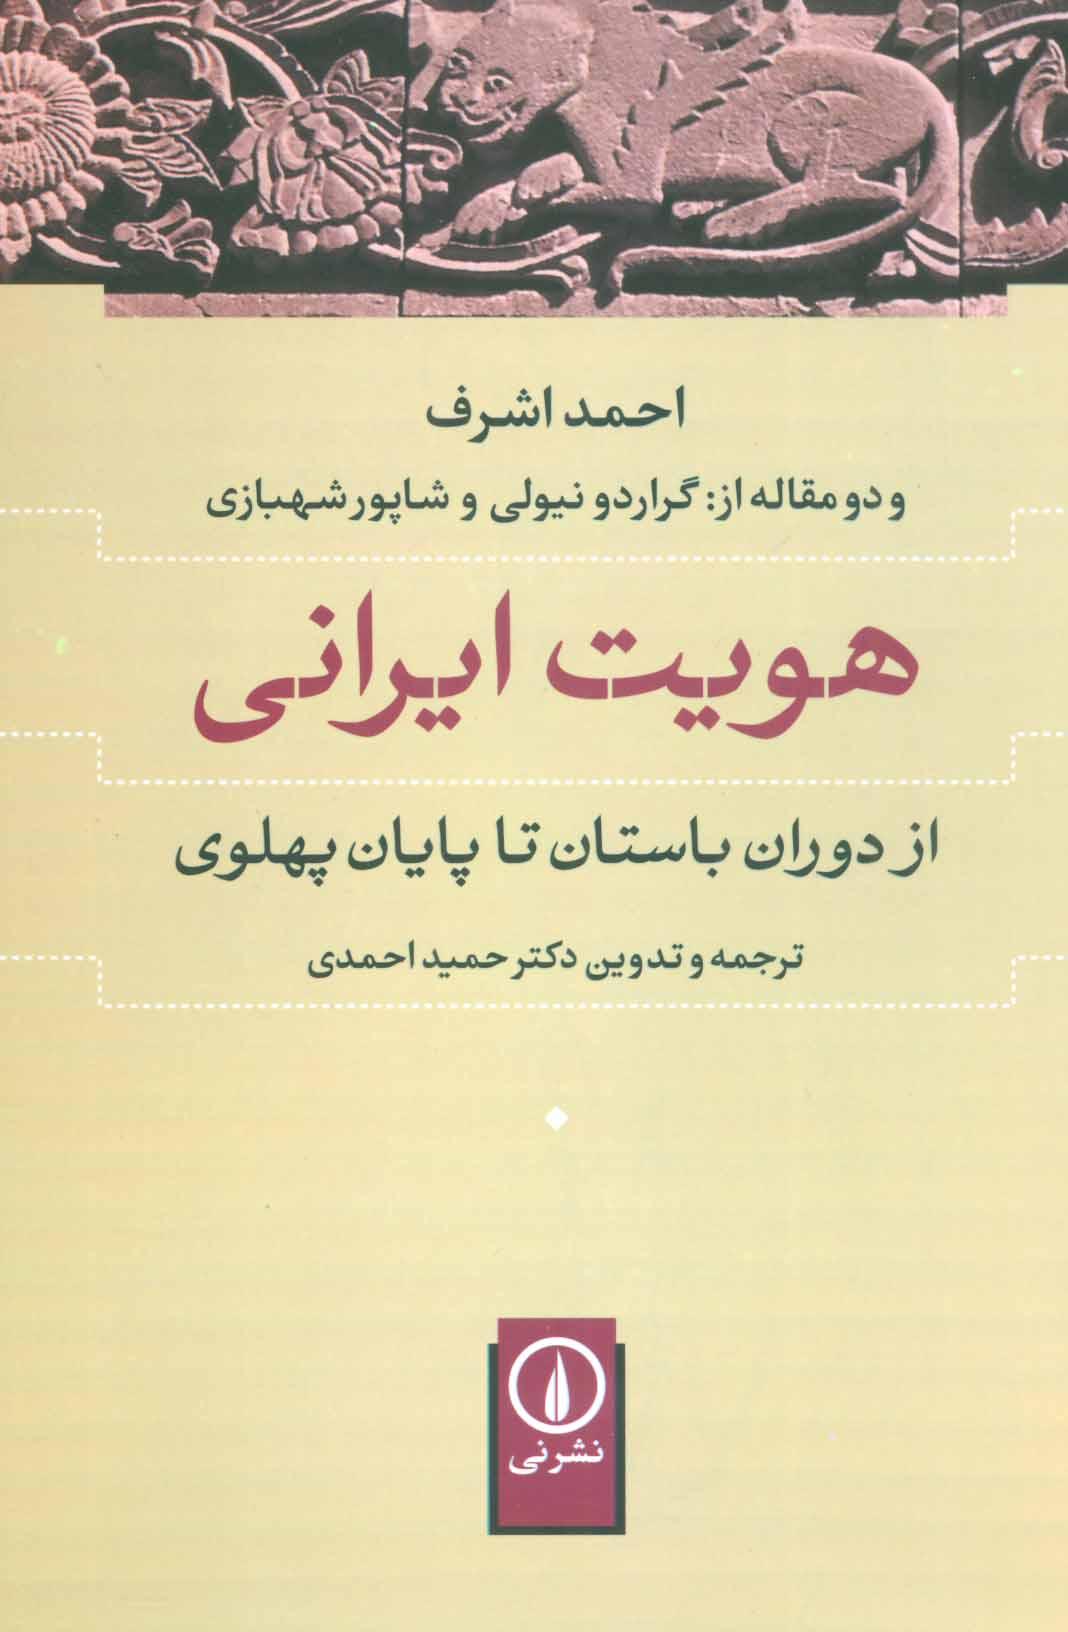 هویت ایرانی (از دوران باستان تا پایان پهلوی)